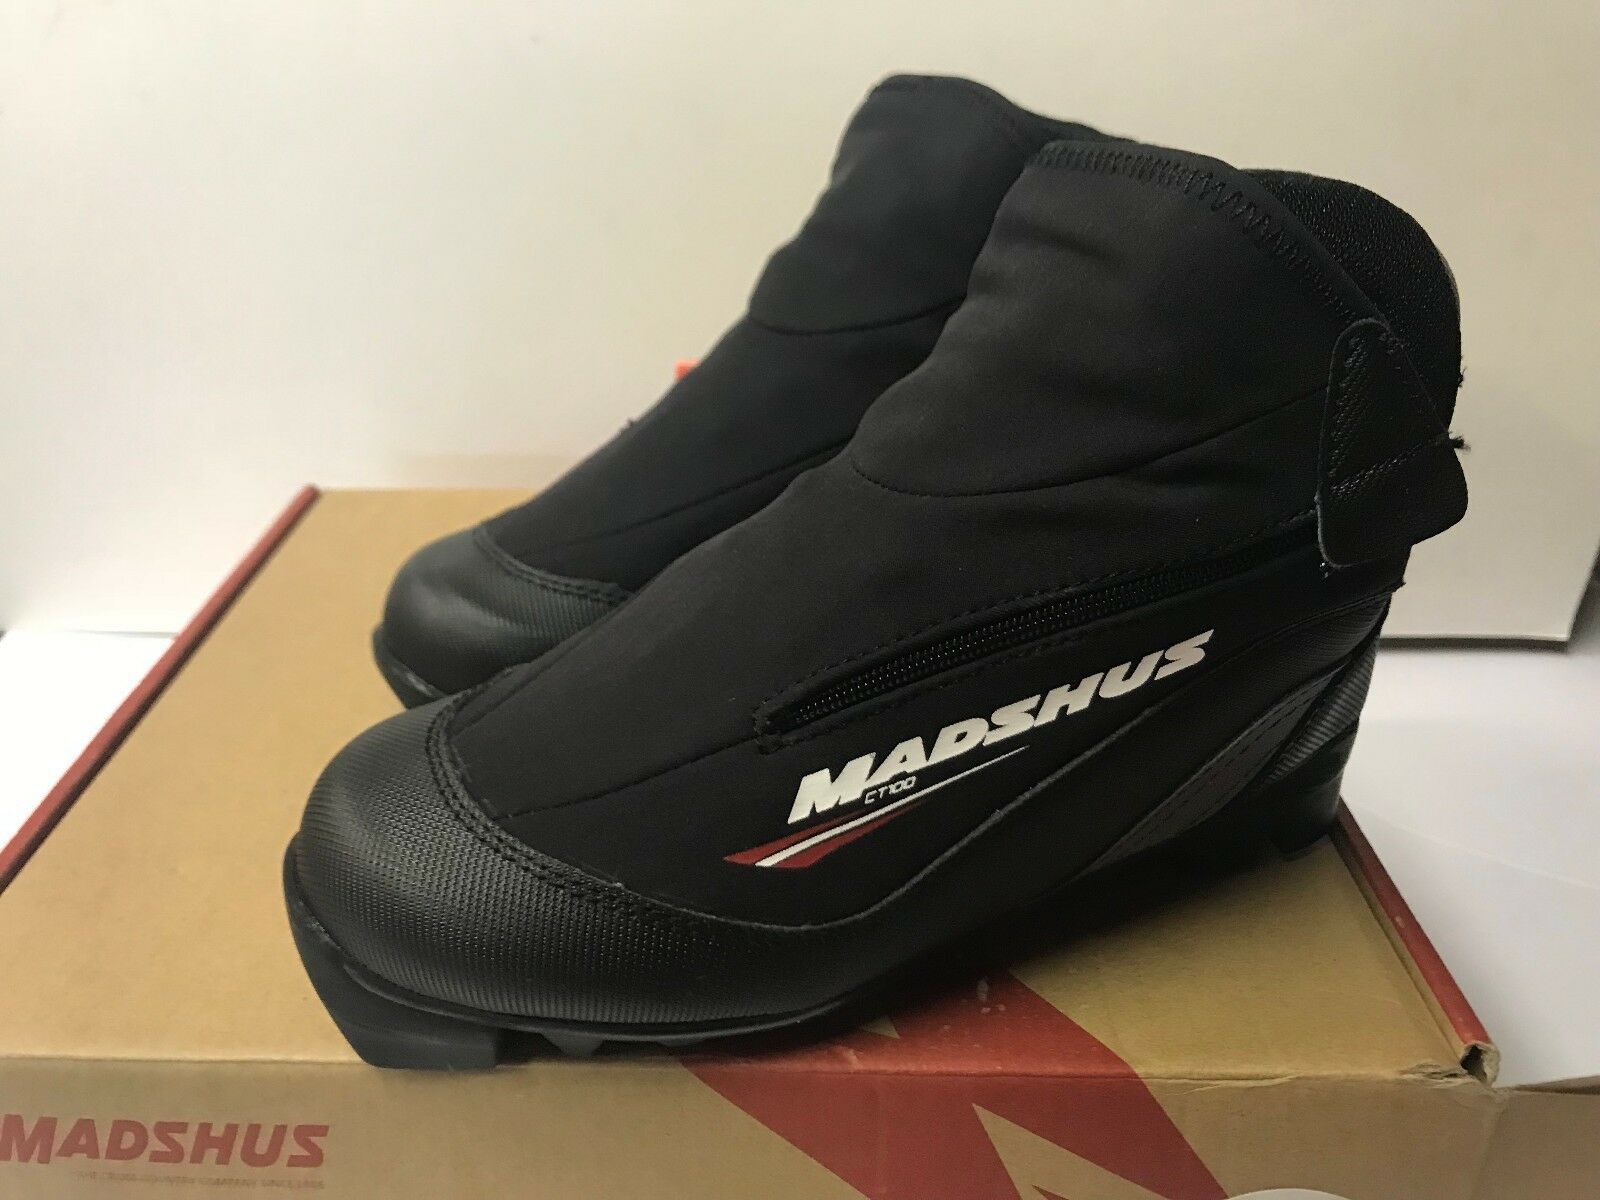 Madshus CT 100 Ski Boot Cross County Nordic Touring Boots Mens 3 Women 4